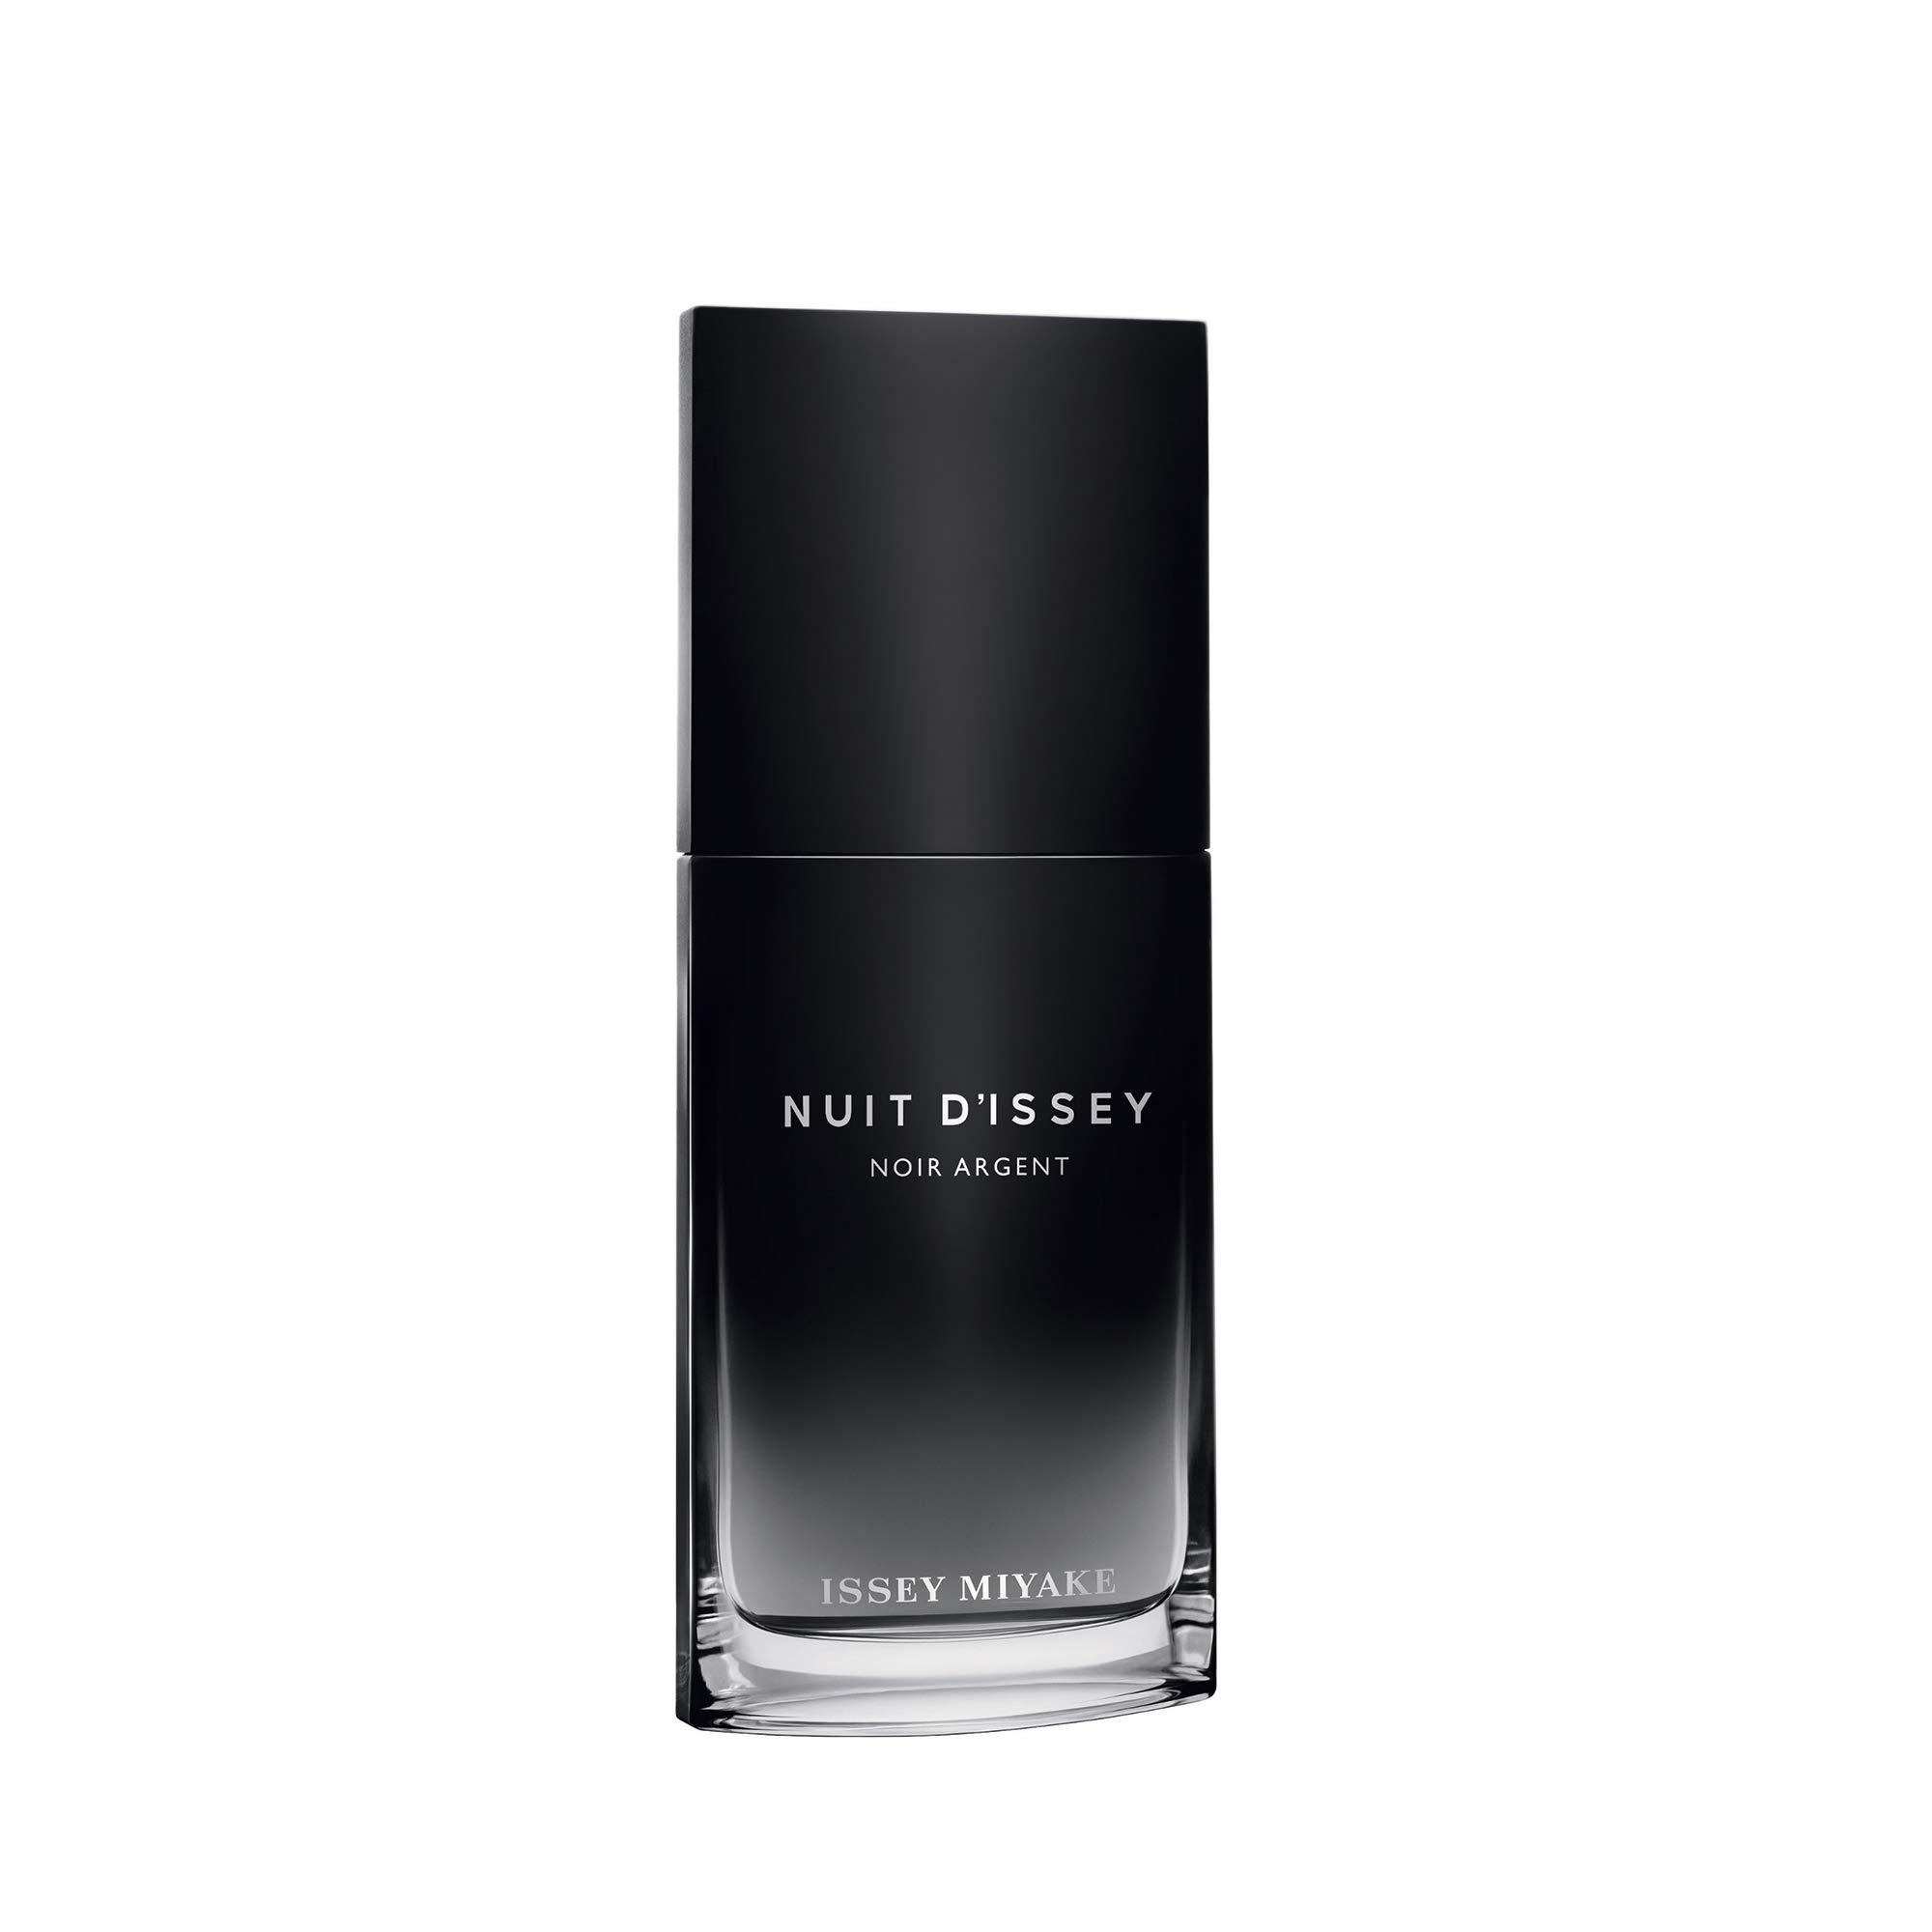 Issey Miyake Nuit D'issey Noir Argent By Issey Miyake for Men 3.3 Oz Eau De Parfum Spray, 1 Oz